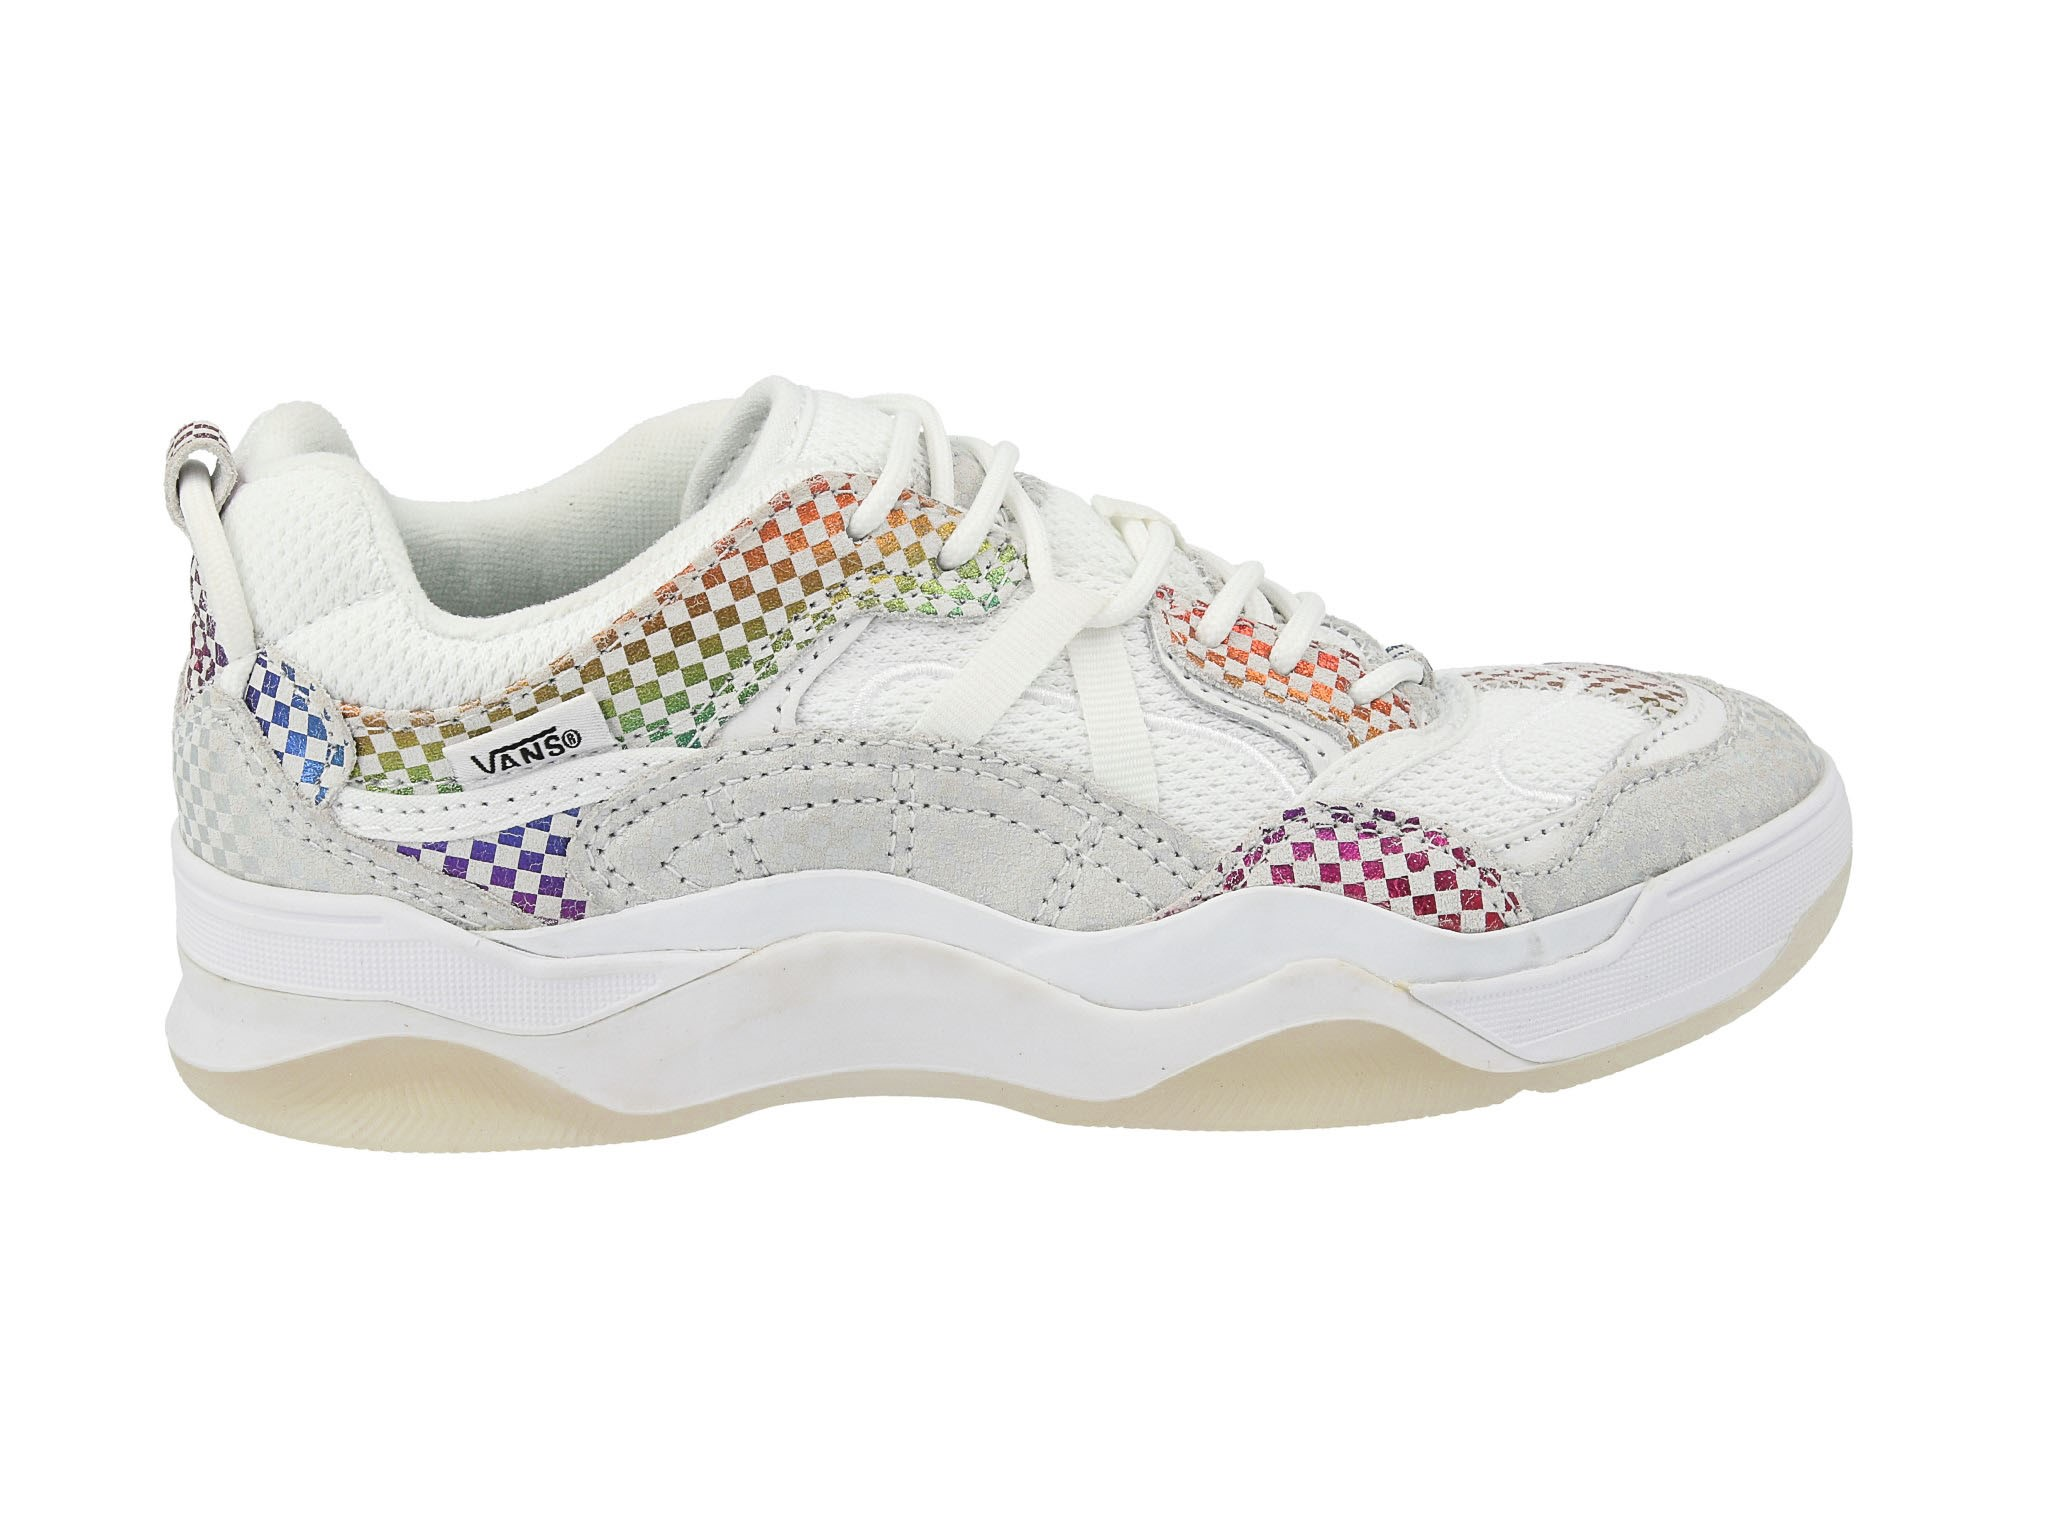 Sneakers VANS - Varix Wc VN0A3WLNTYV1 (Windbreakr) Blcdblctkshtl - Sneakers - Halbschuhe - Damenschuhe